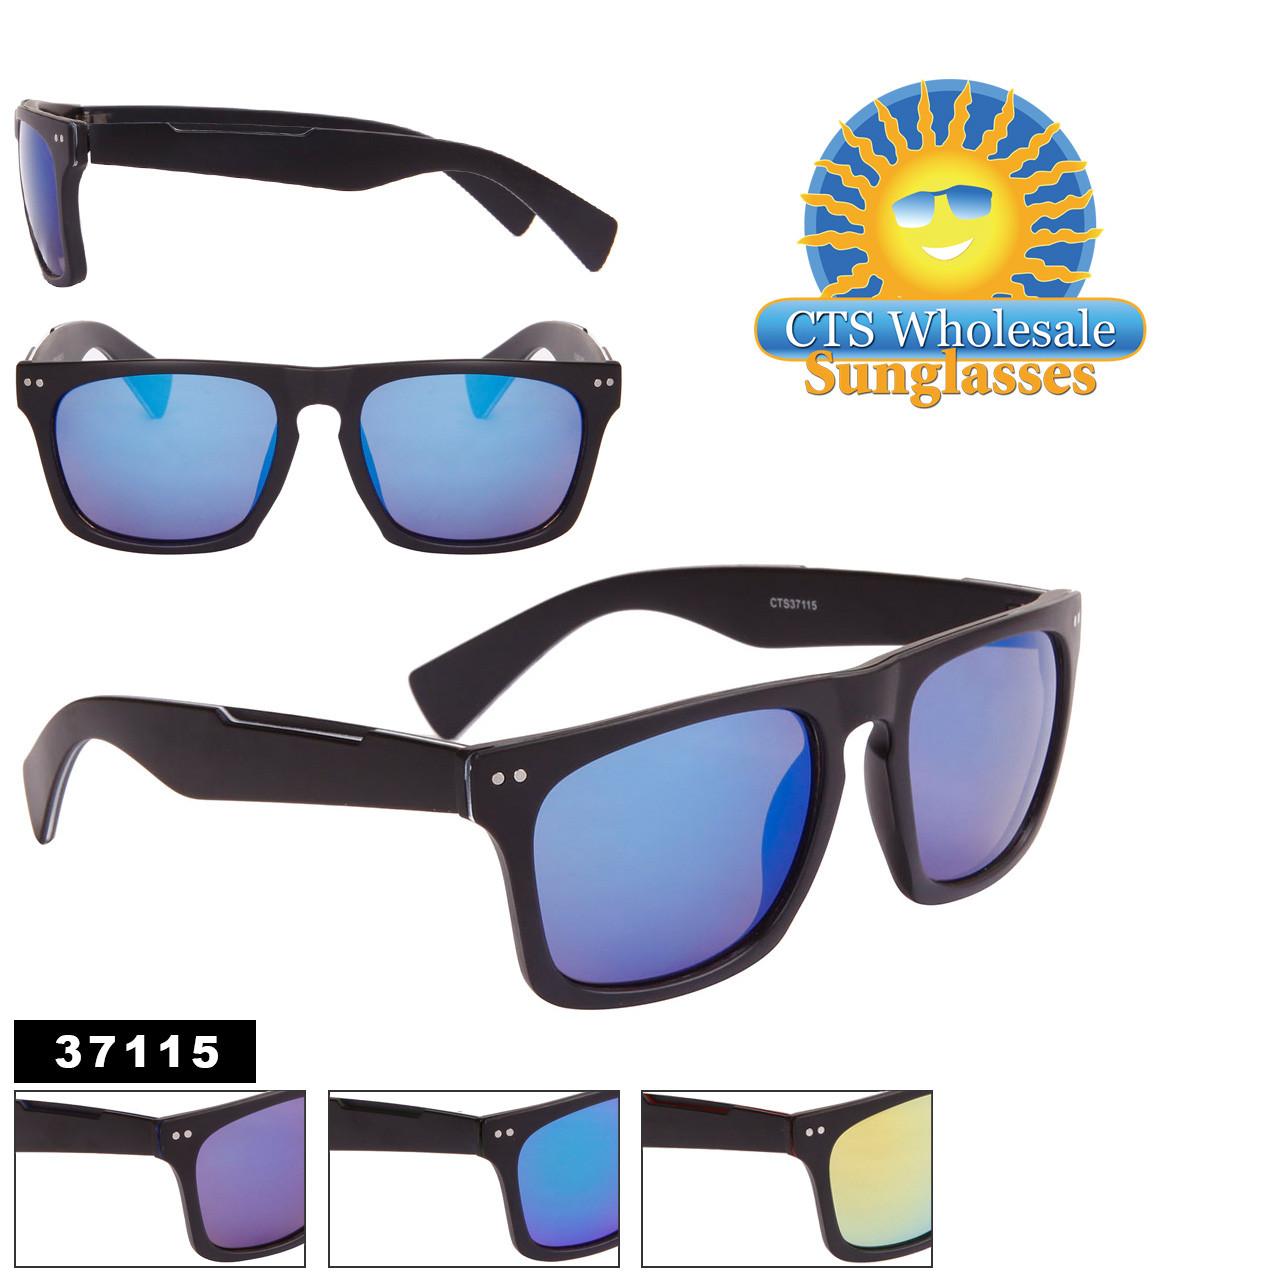 Mirrored Unisex Sunglasses by the Dozen - Style #37115